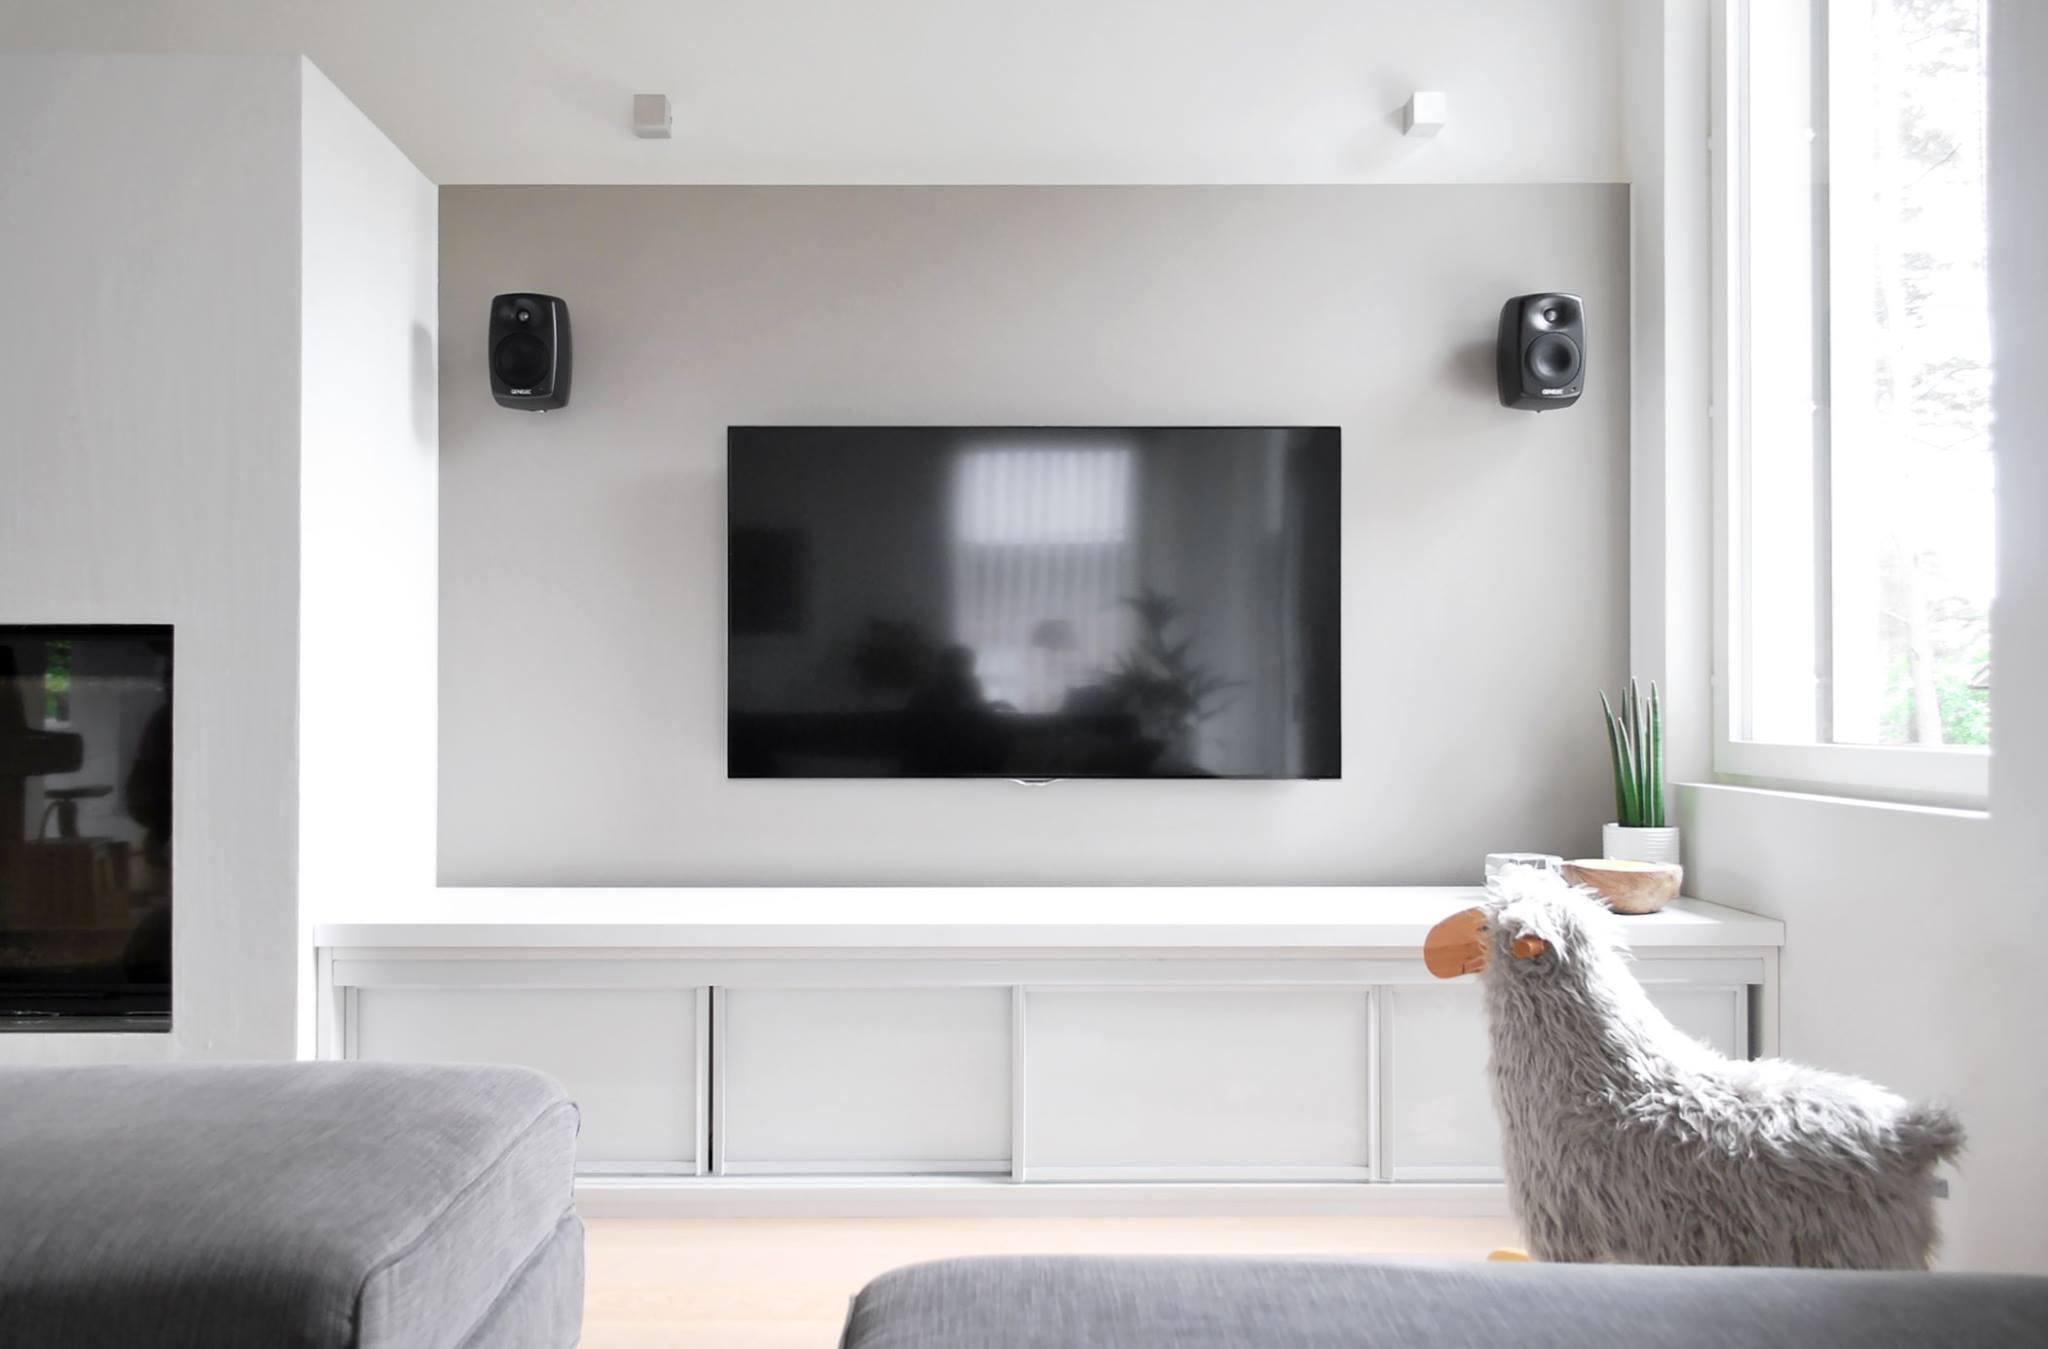 Moderni kivitalo – Tv-taso